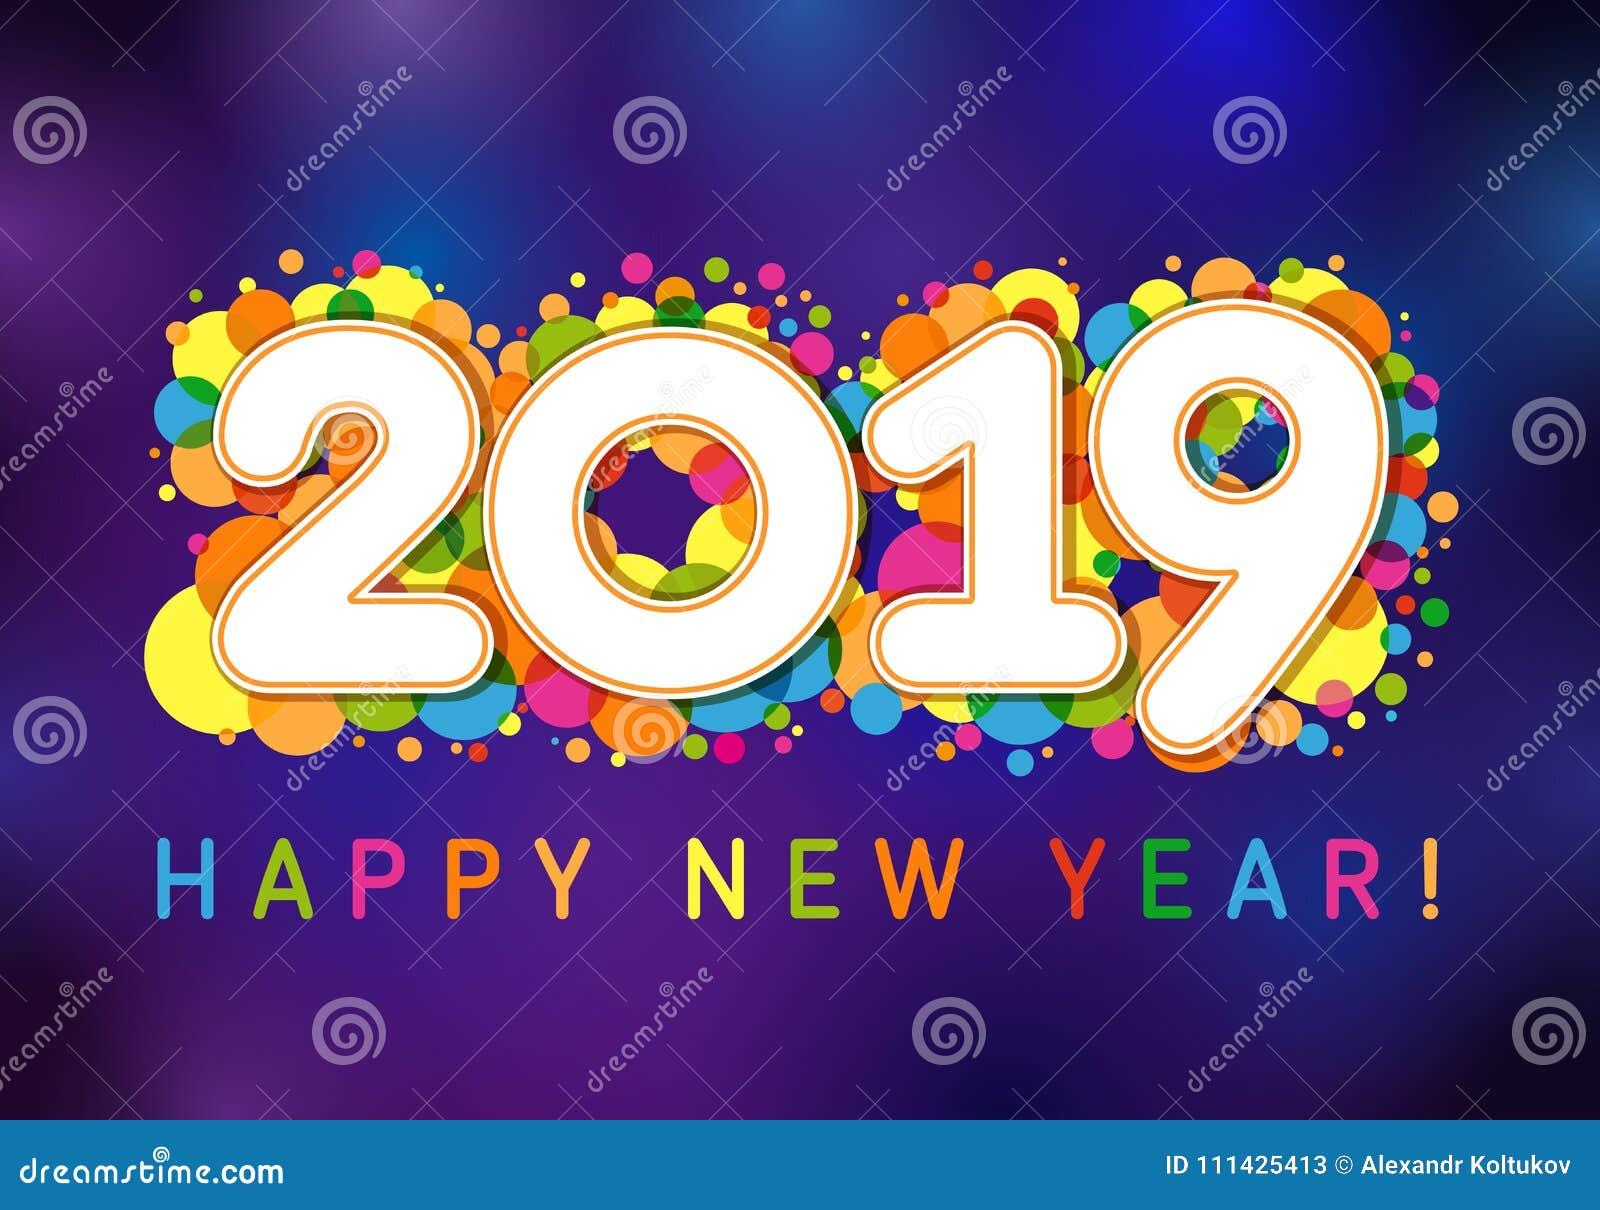 Happy new year 2019 - 3 3